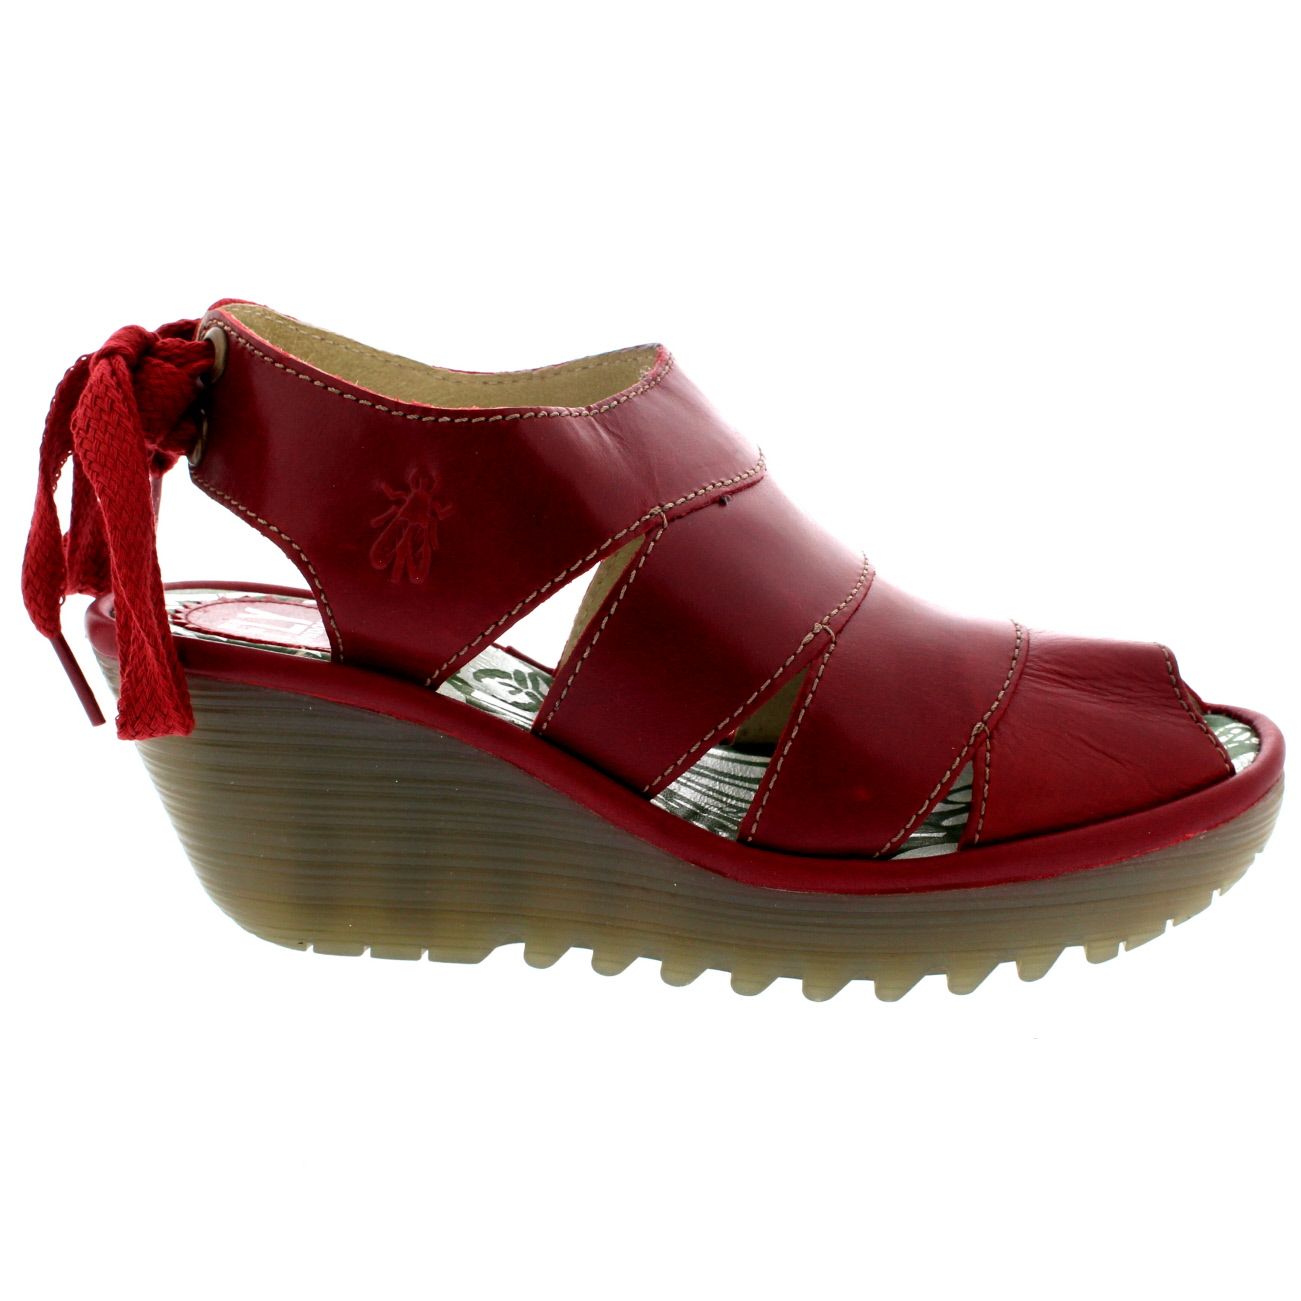 Ladies Fly London Yown Rug Laced Peep Toe Wedges Leather